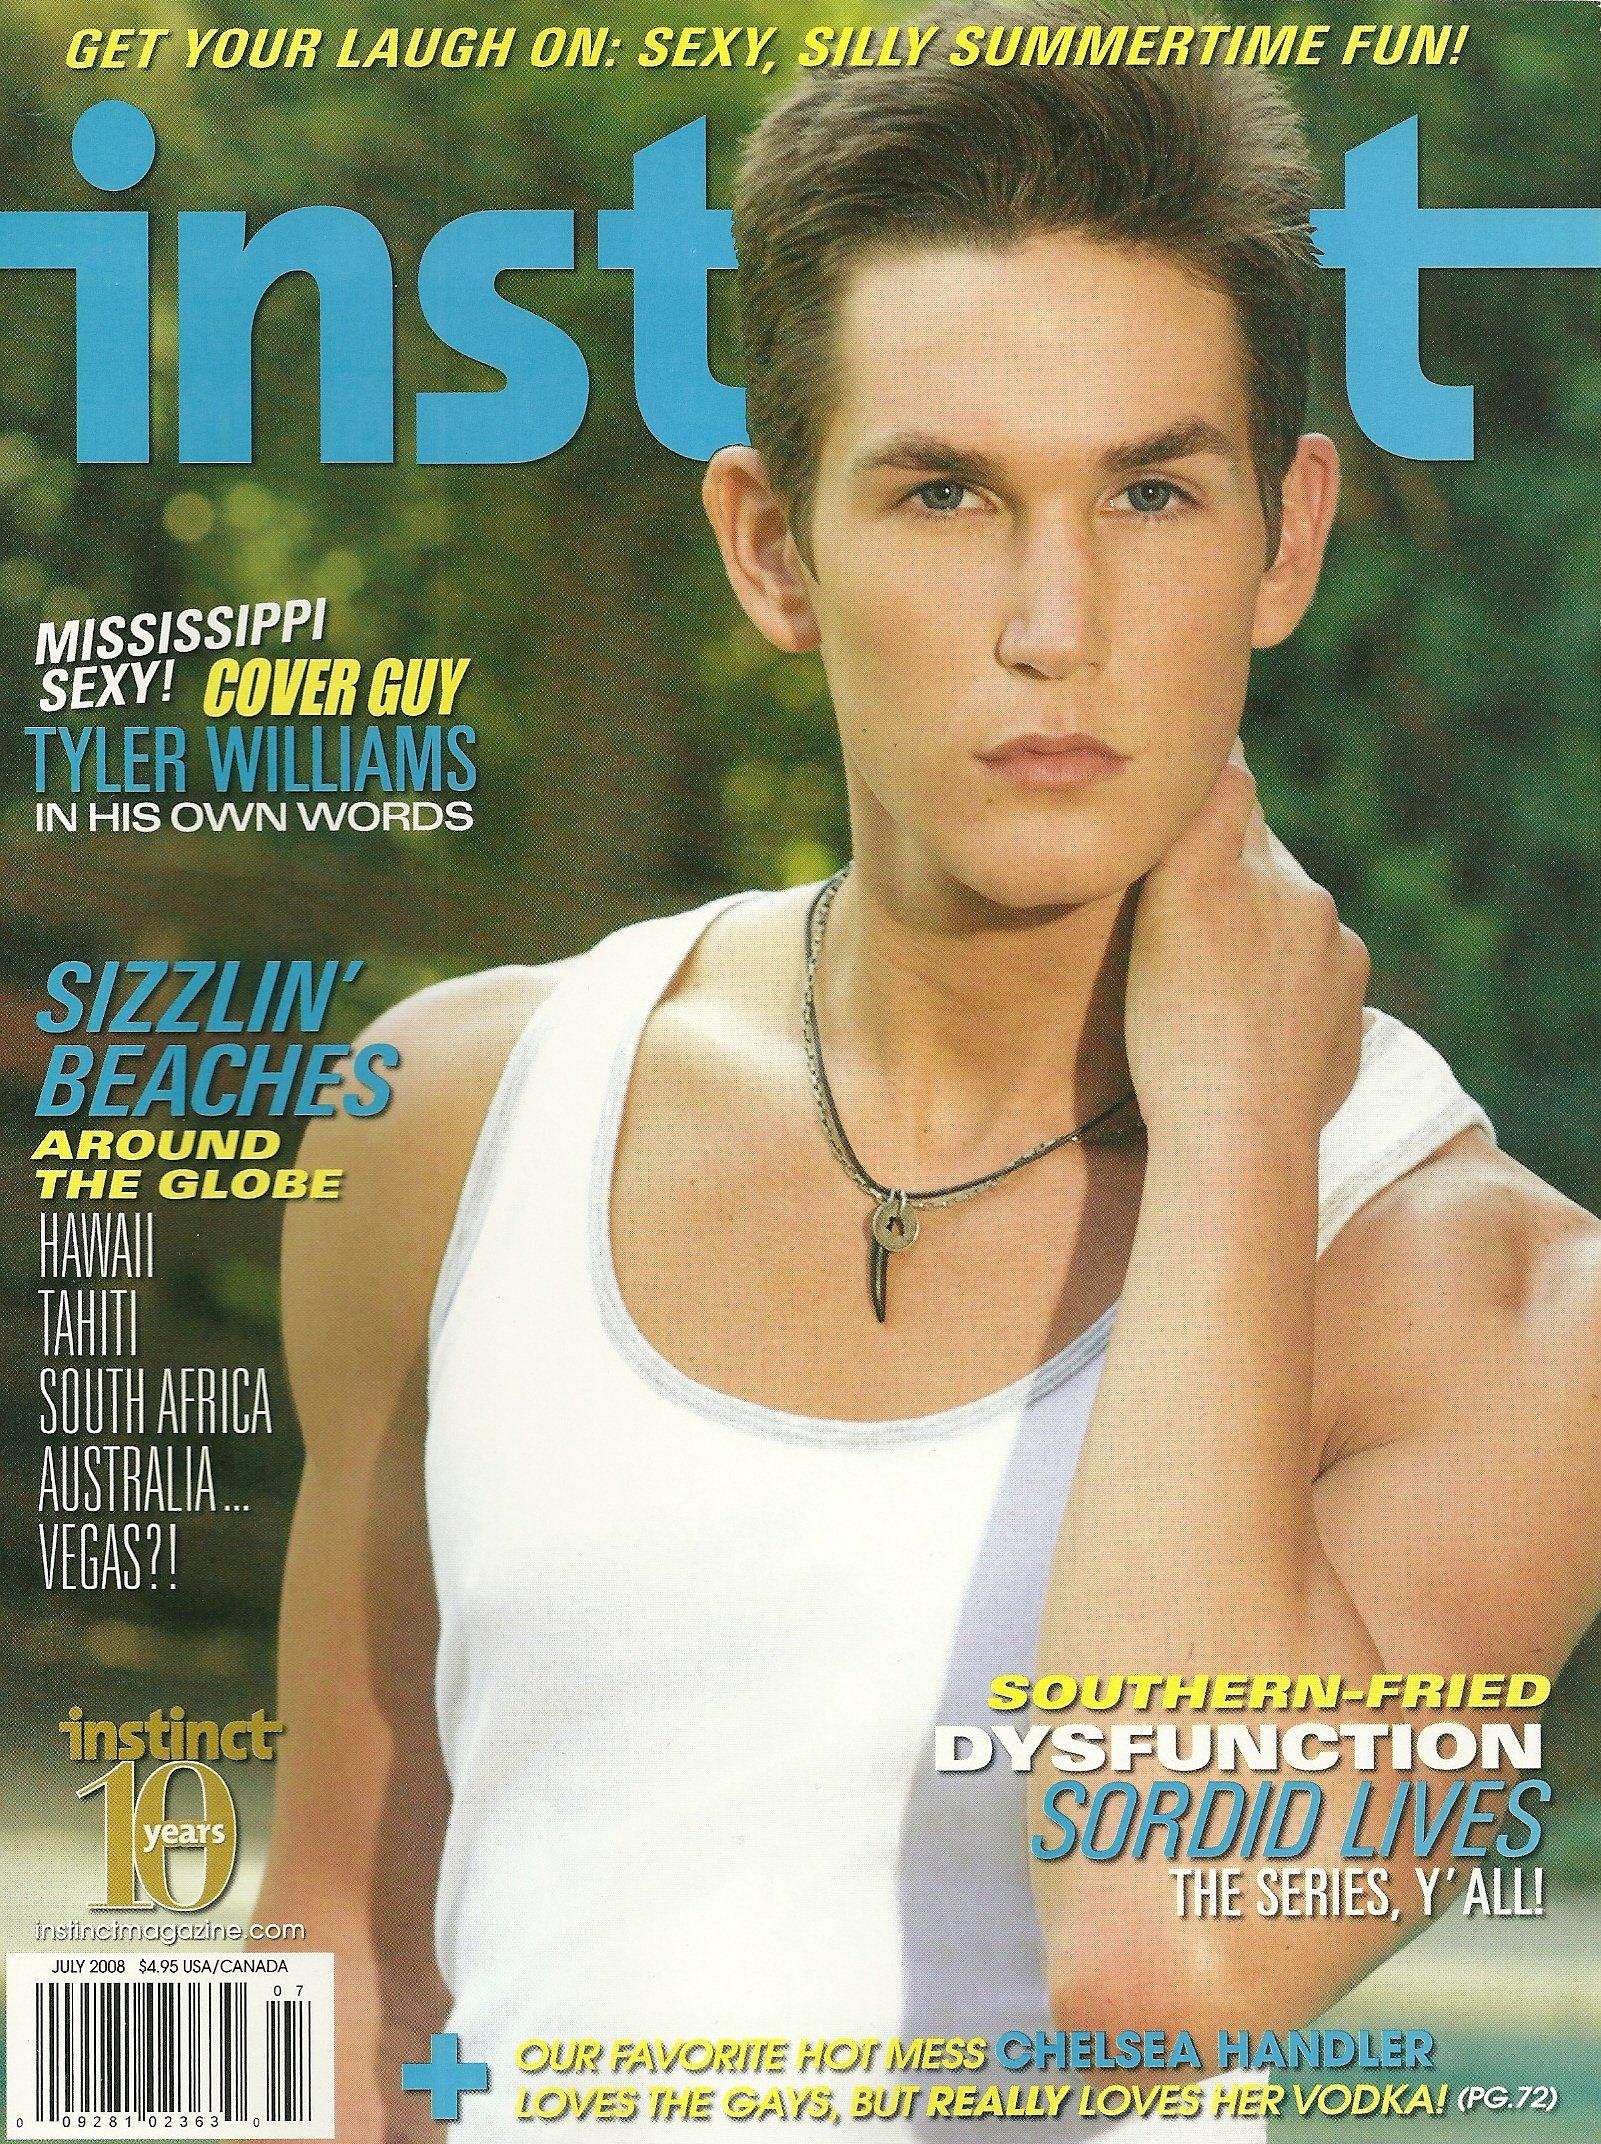 Download Tyler Williams, Gay Beaches of Hawaii, Tahiti, South Africa, Australia, Sordid Lives, Chelsea Handler - July, 2008 Volume 11, Issue 7 Instinct Magazine PDF